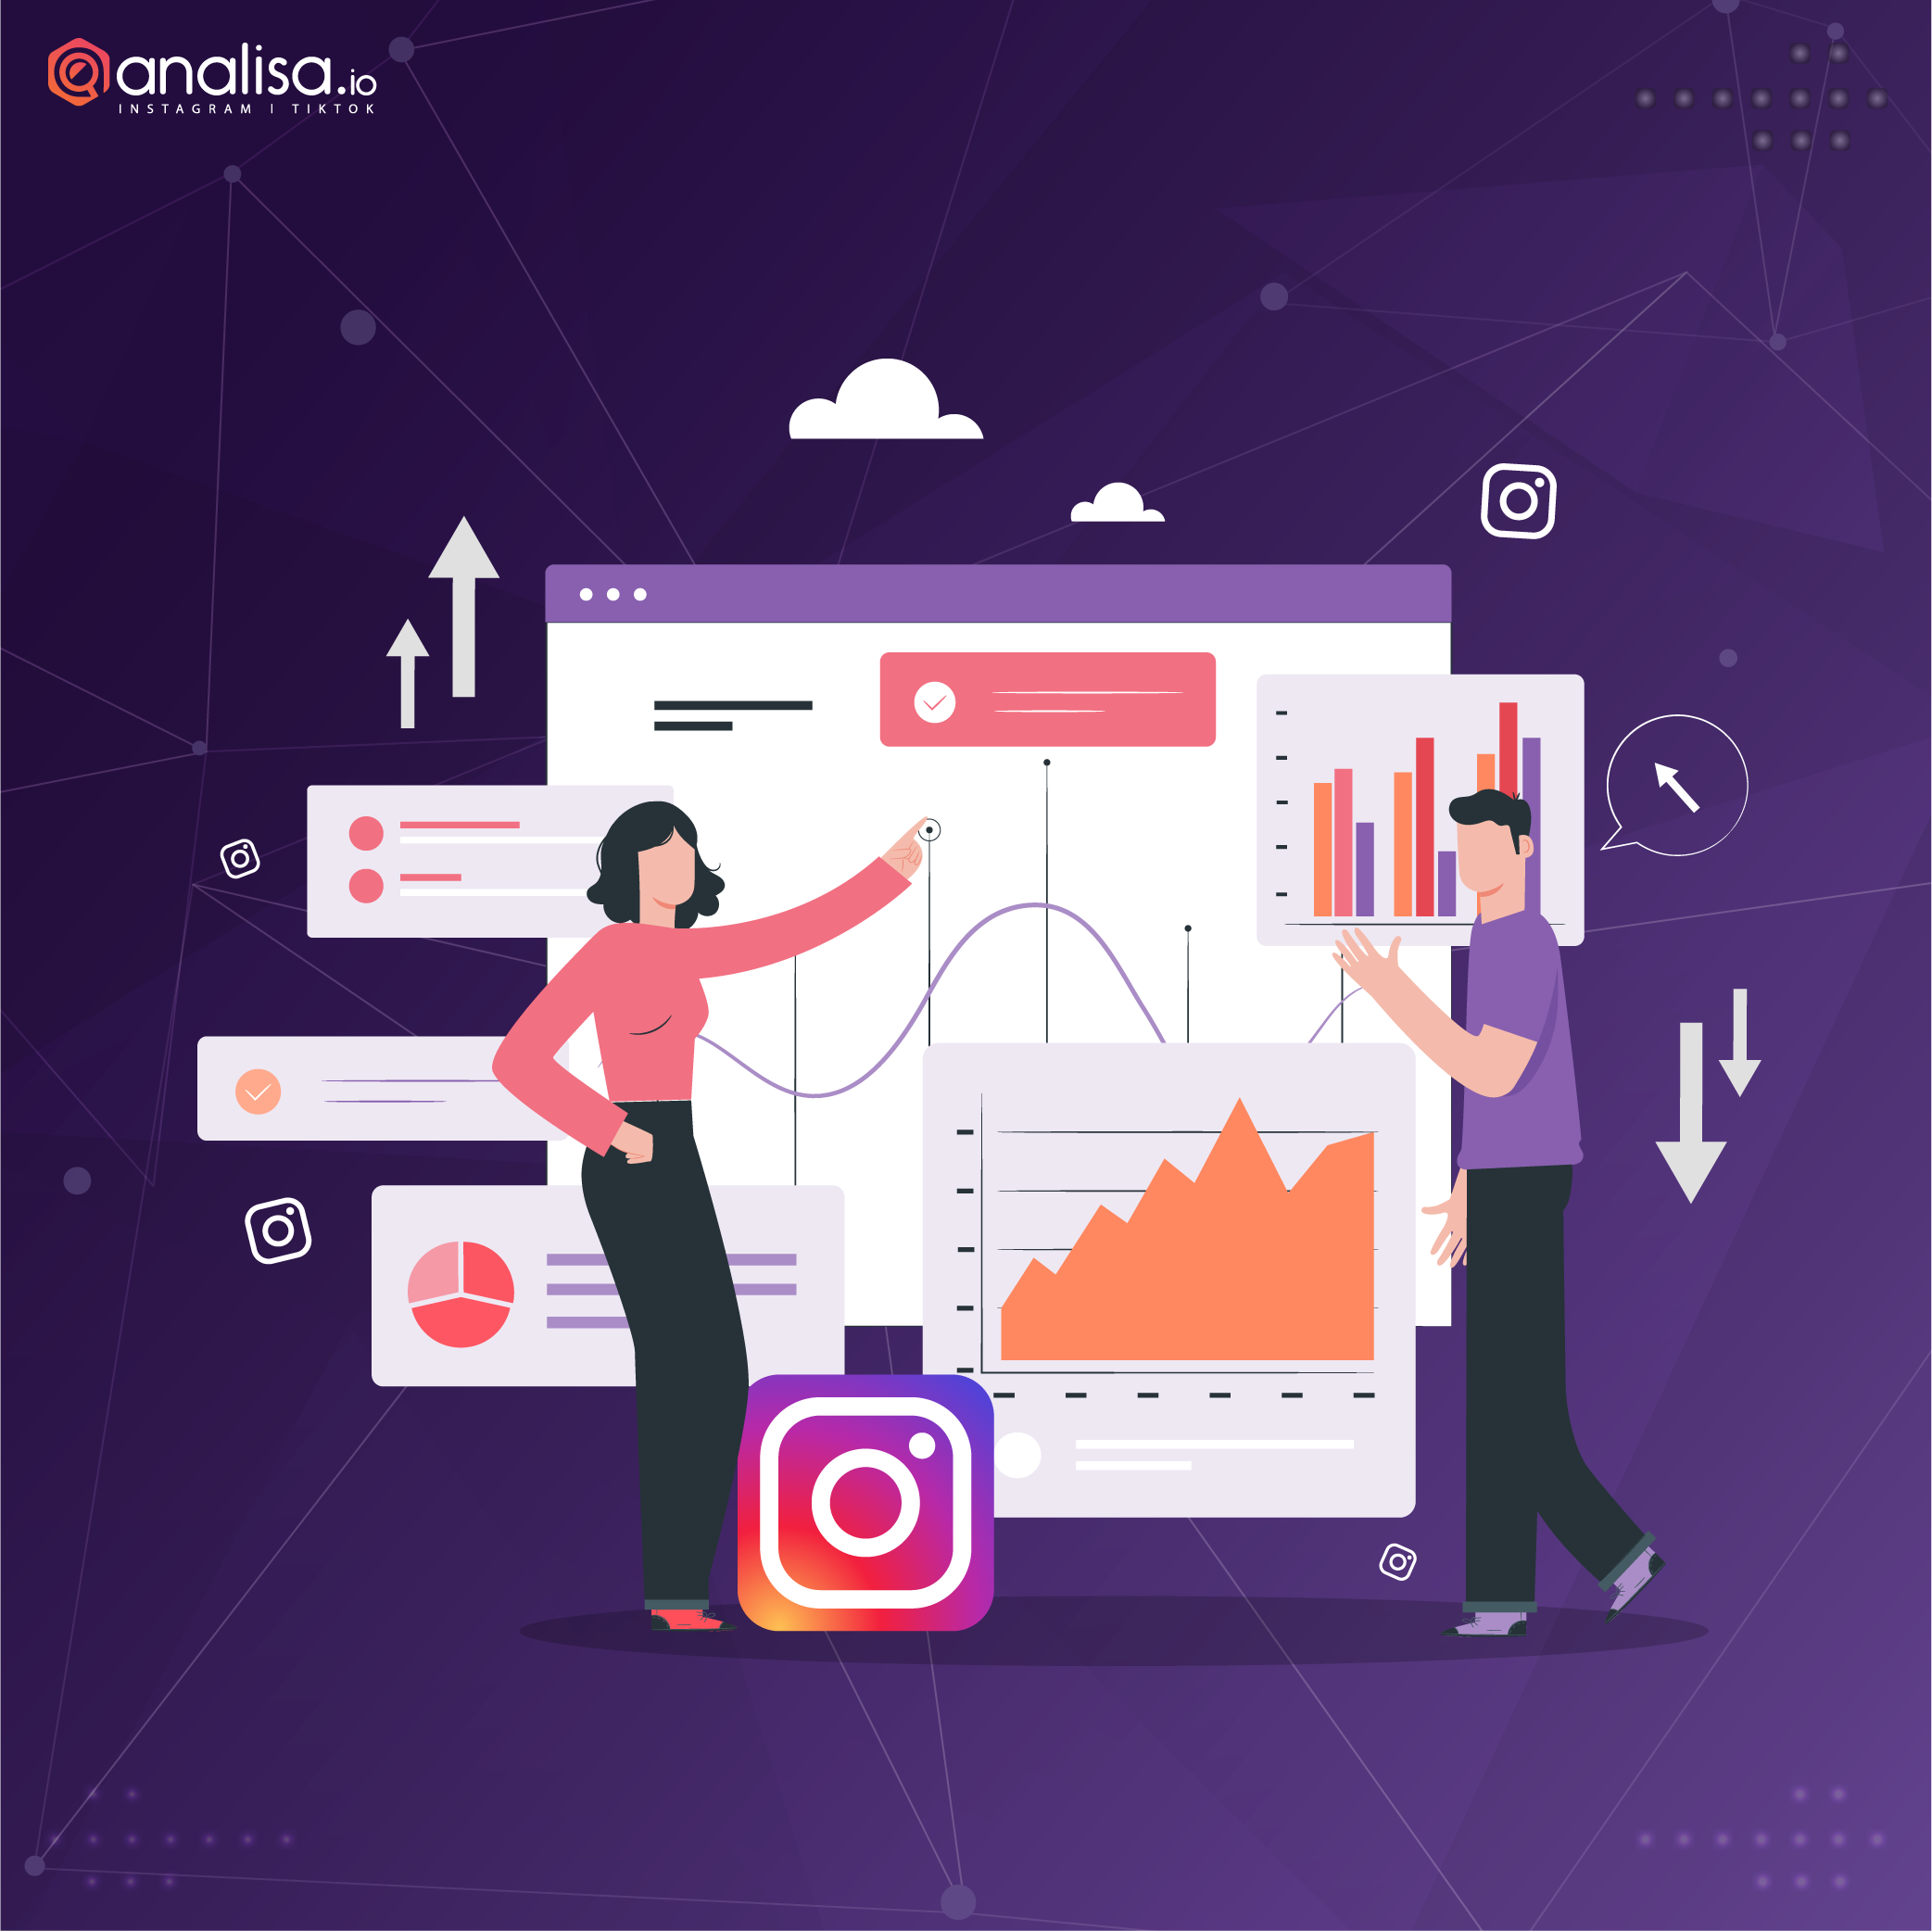 5 Instagram Analytics Metrics You Need to Know